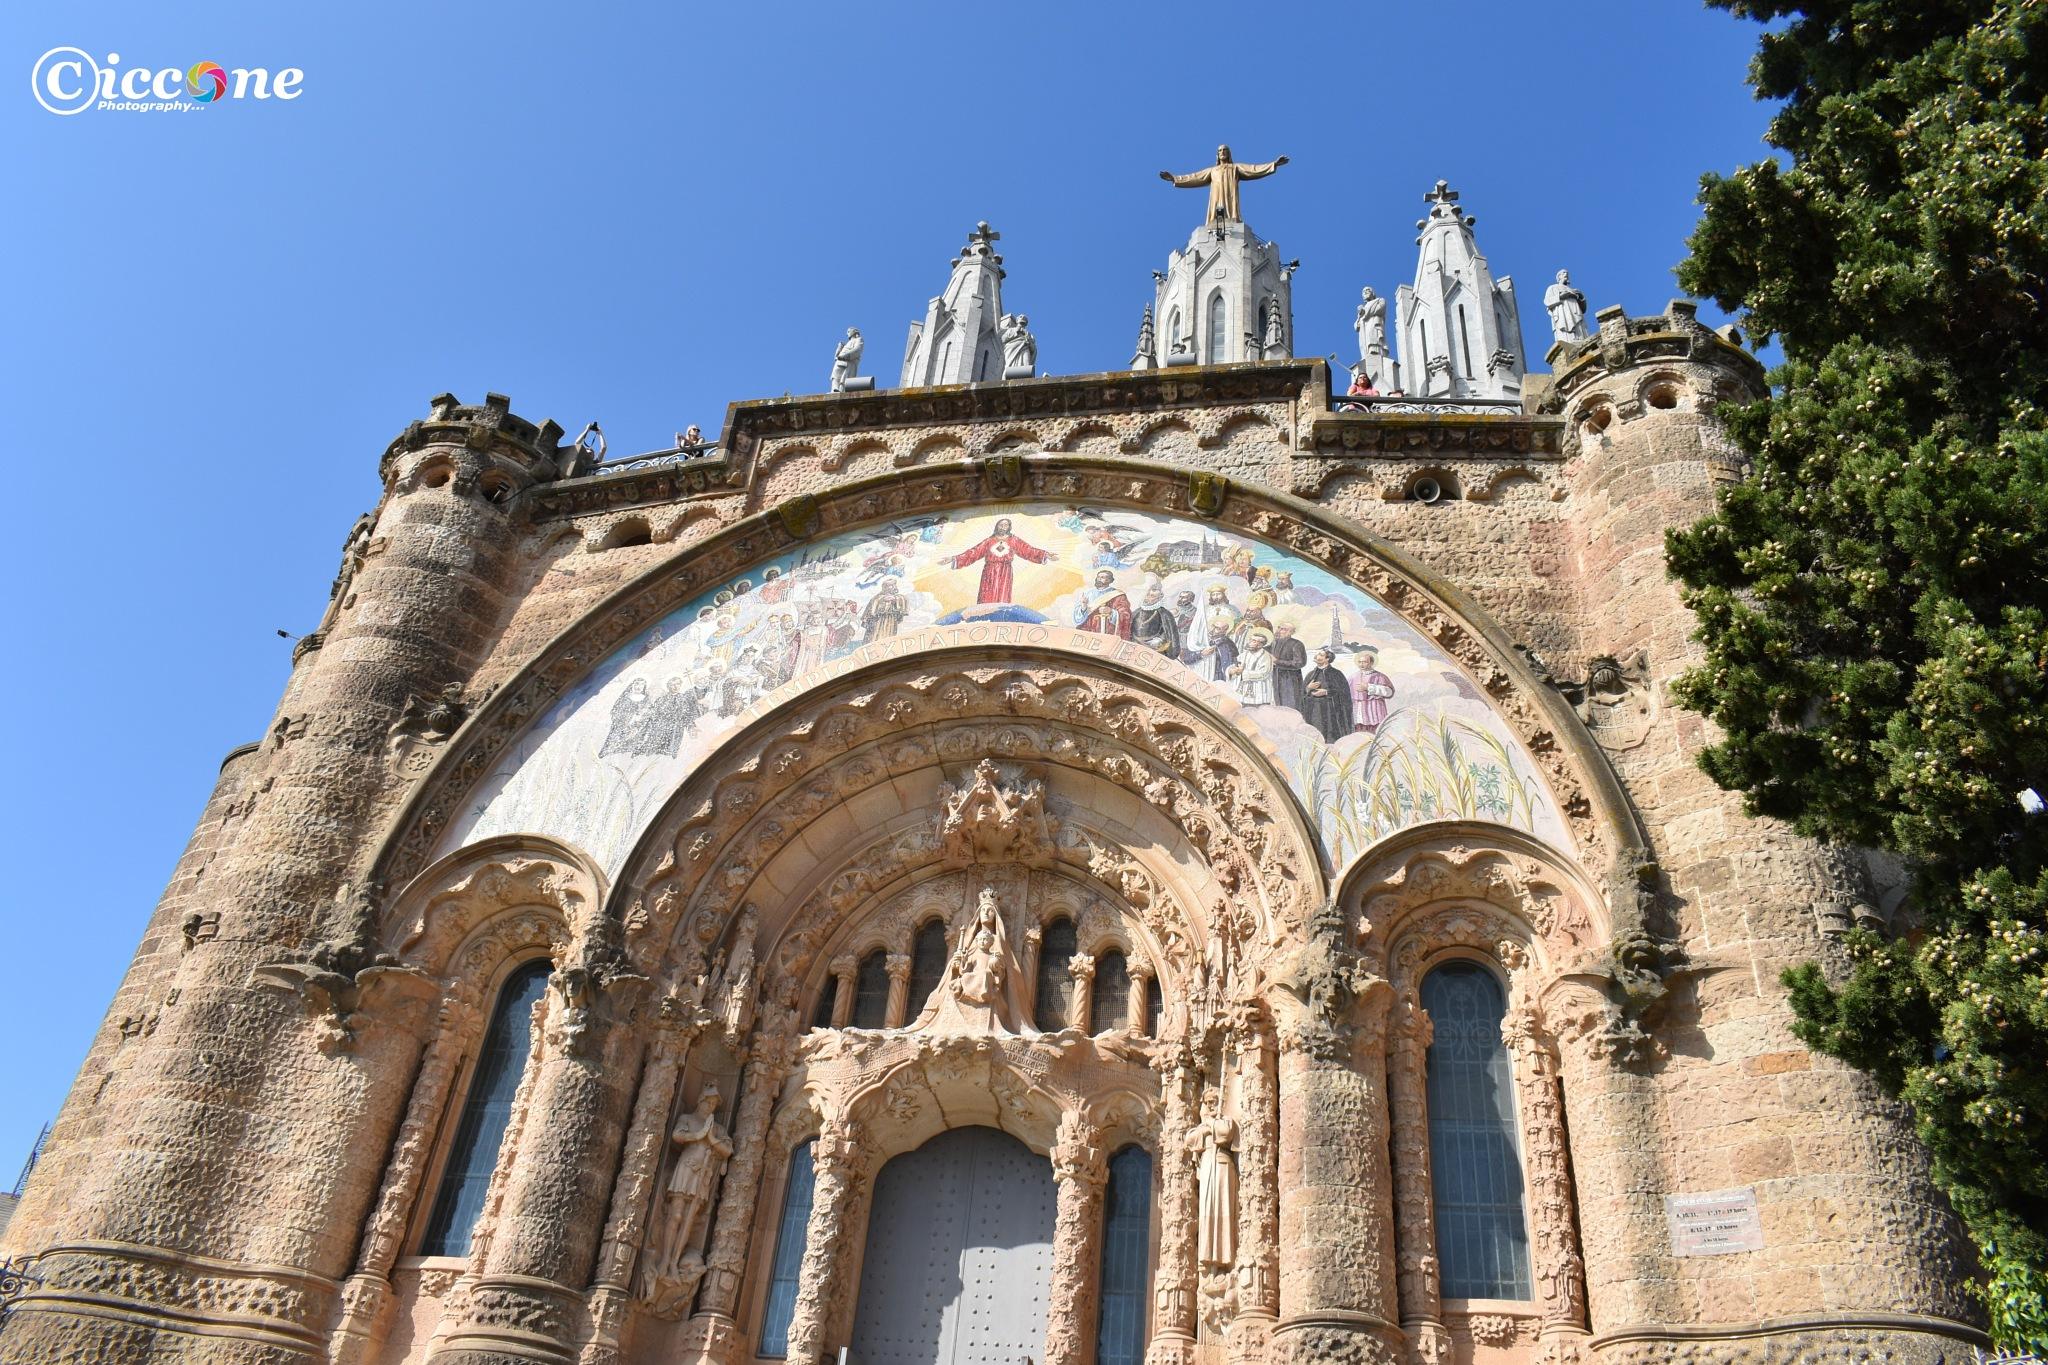 Tibidabo Church and Amusement Park by Marc Ciccone